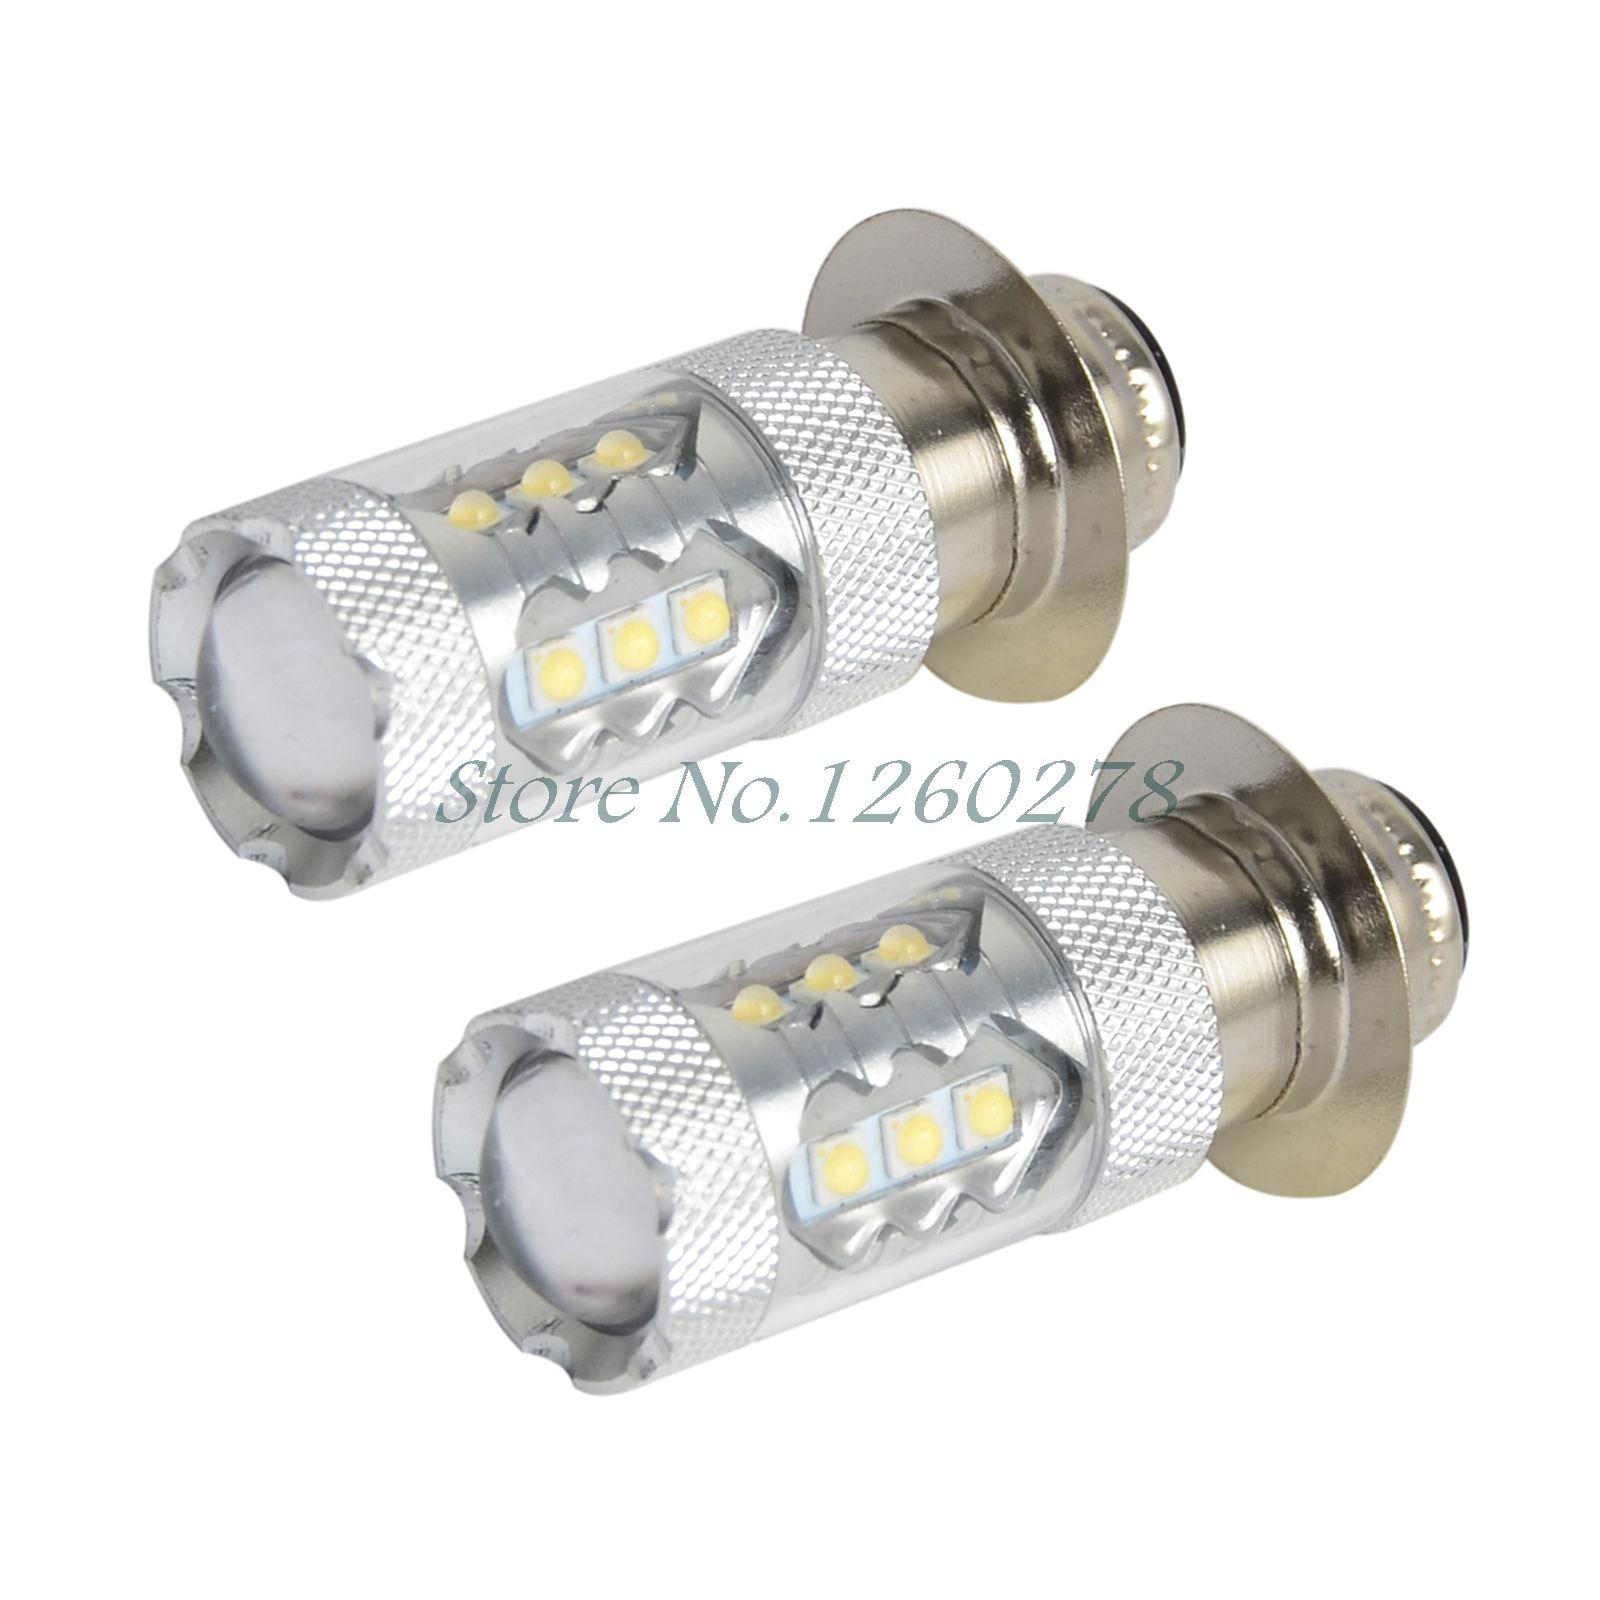 2PCS 80W Super White LED Headlights Bulbs Upgrade For Yamaha ATVS YFM350 400 450 660 700 Raptor Blaster 200 Banshee 350